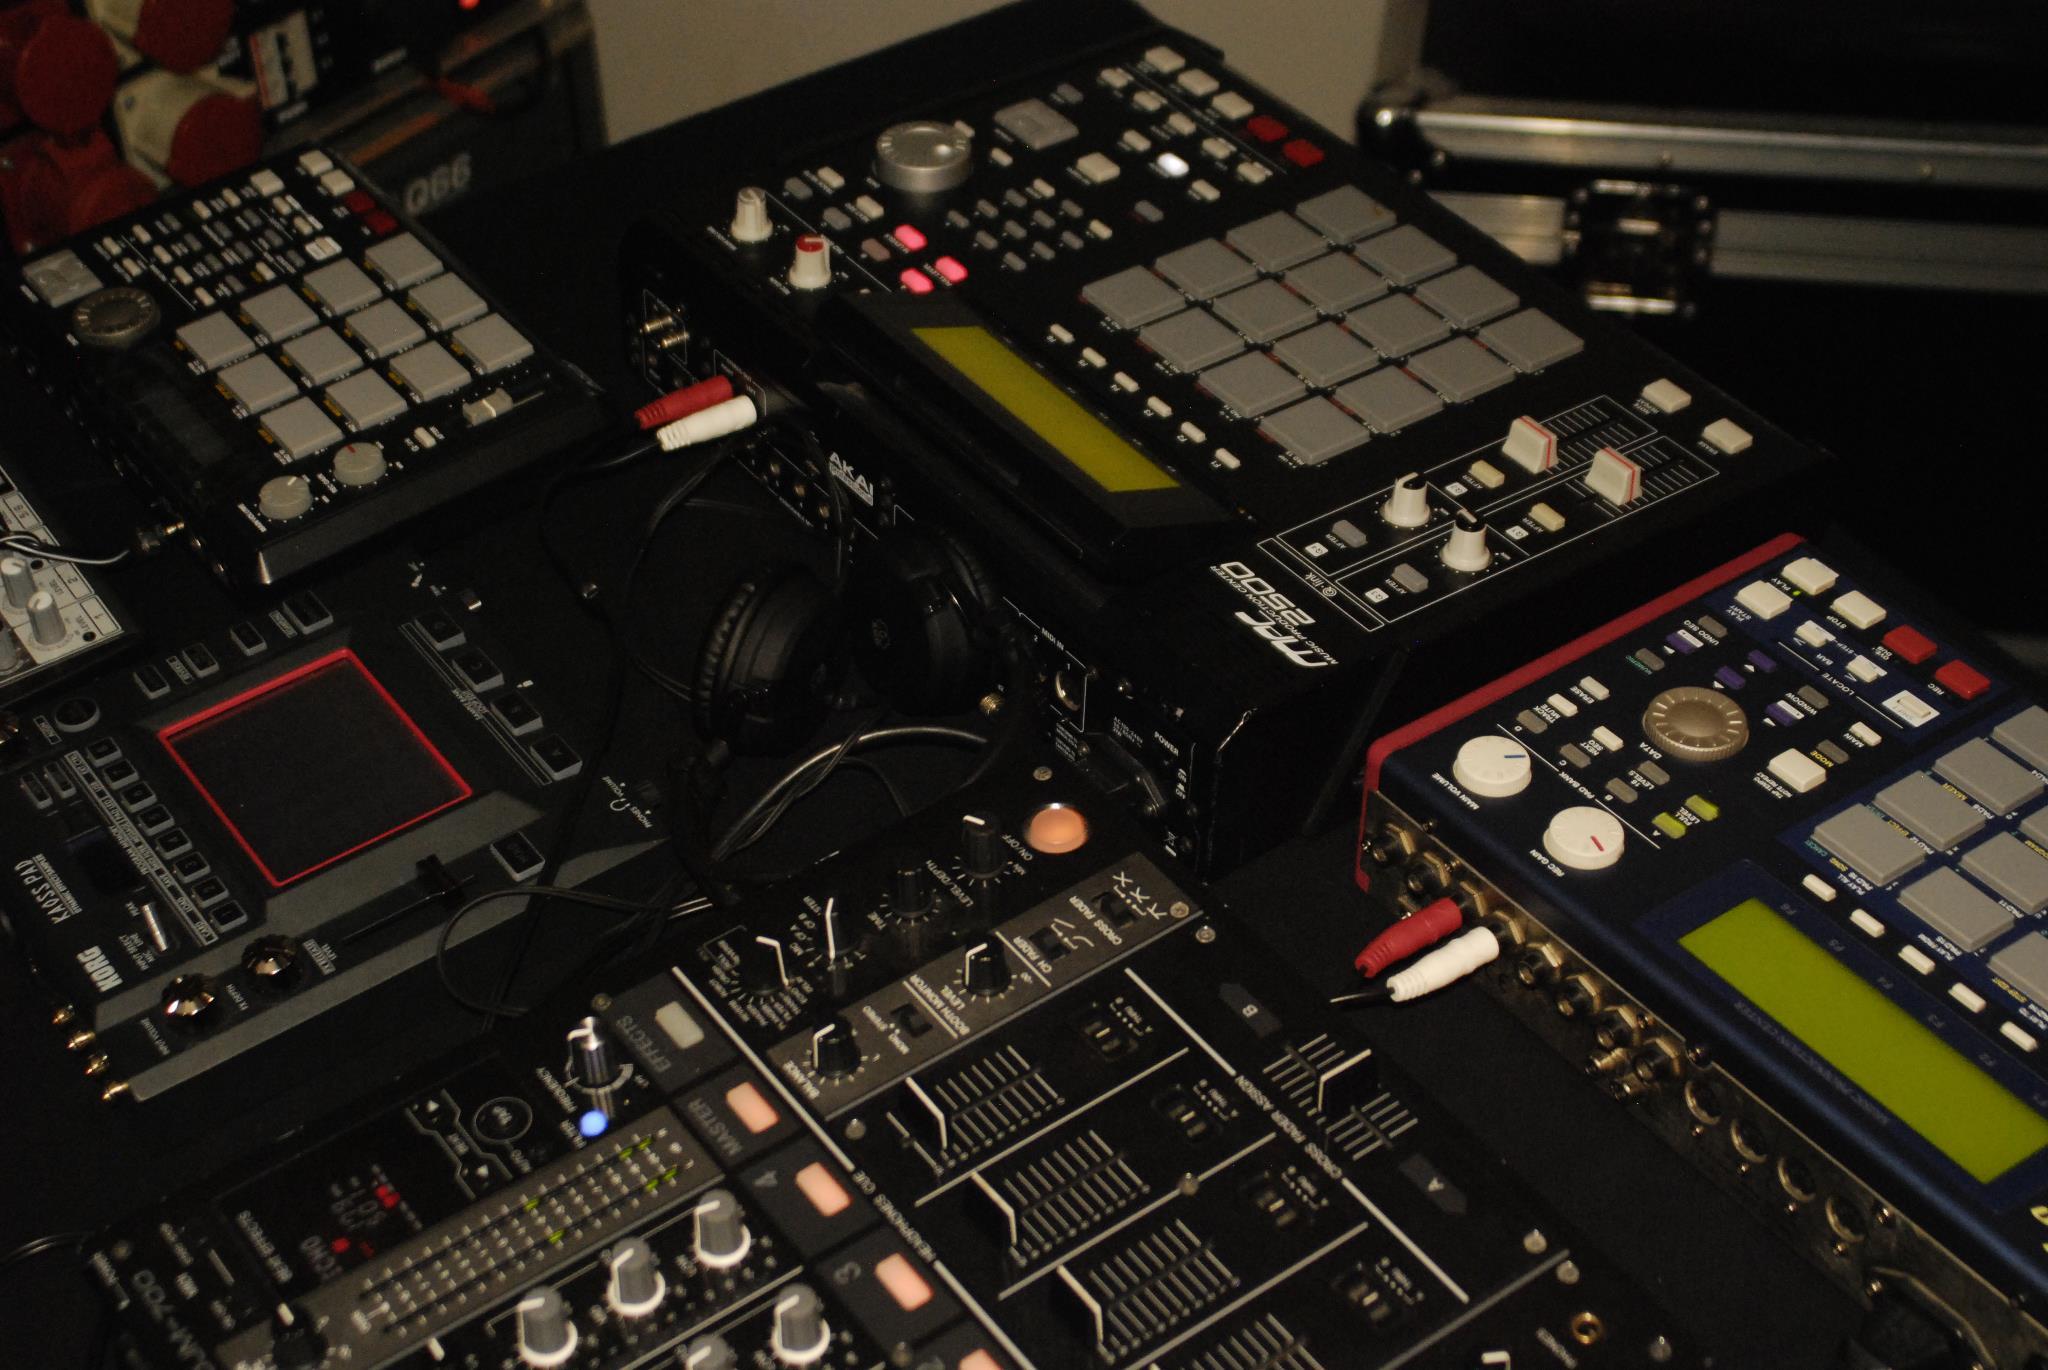 BACKYARD JOINTS @ Panke (Berlin) – LIVE: MT & ArcadeHead / Mixed Ape Morphingaz / DJ's: MT, BeatPete, Djeez & Top Cut